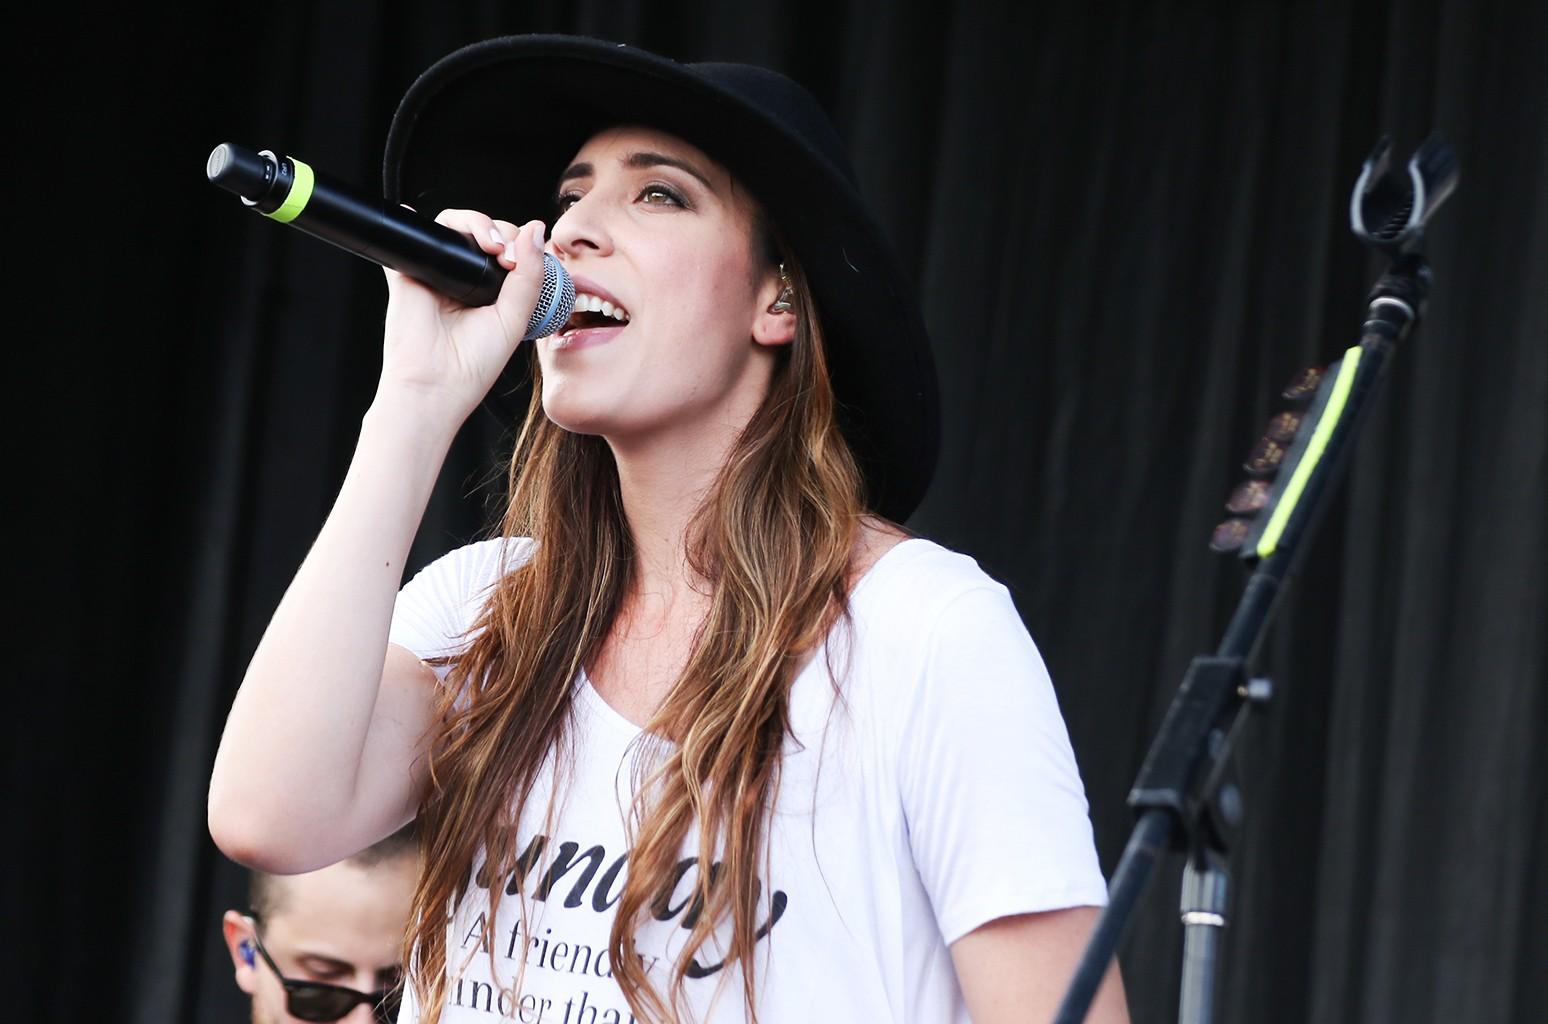 Mariana Vega performs at the Latin Grammy Street Parties Miami on Nov. 8, 2015 in Hialeah, Fla.